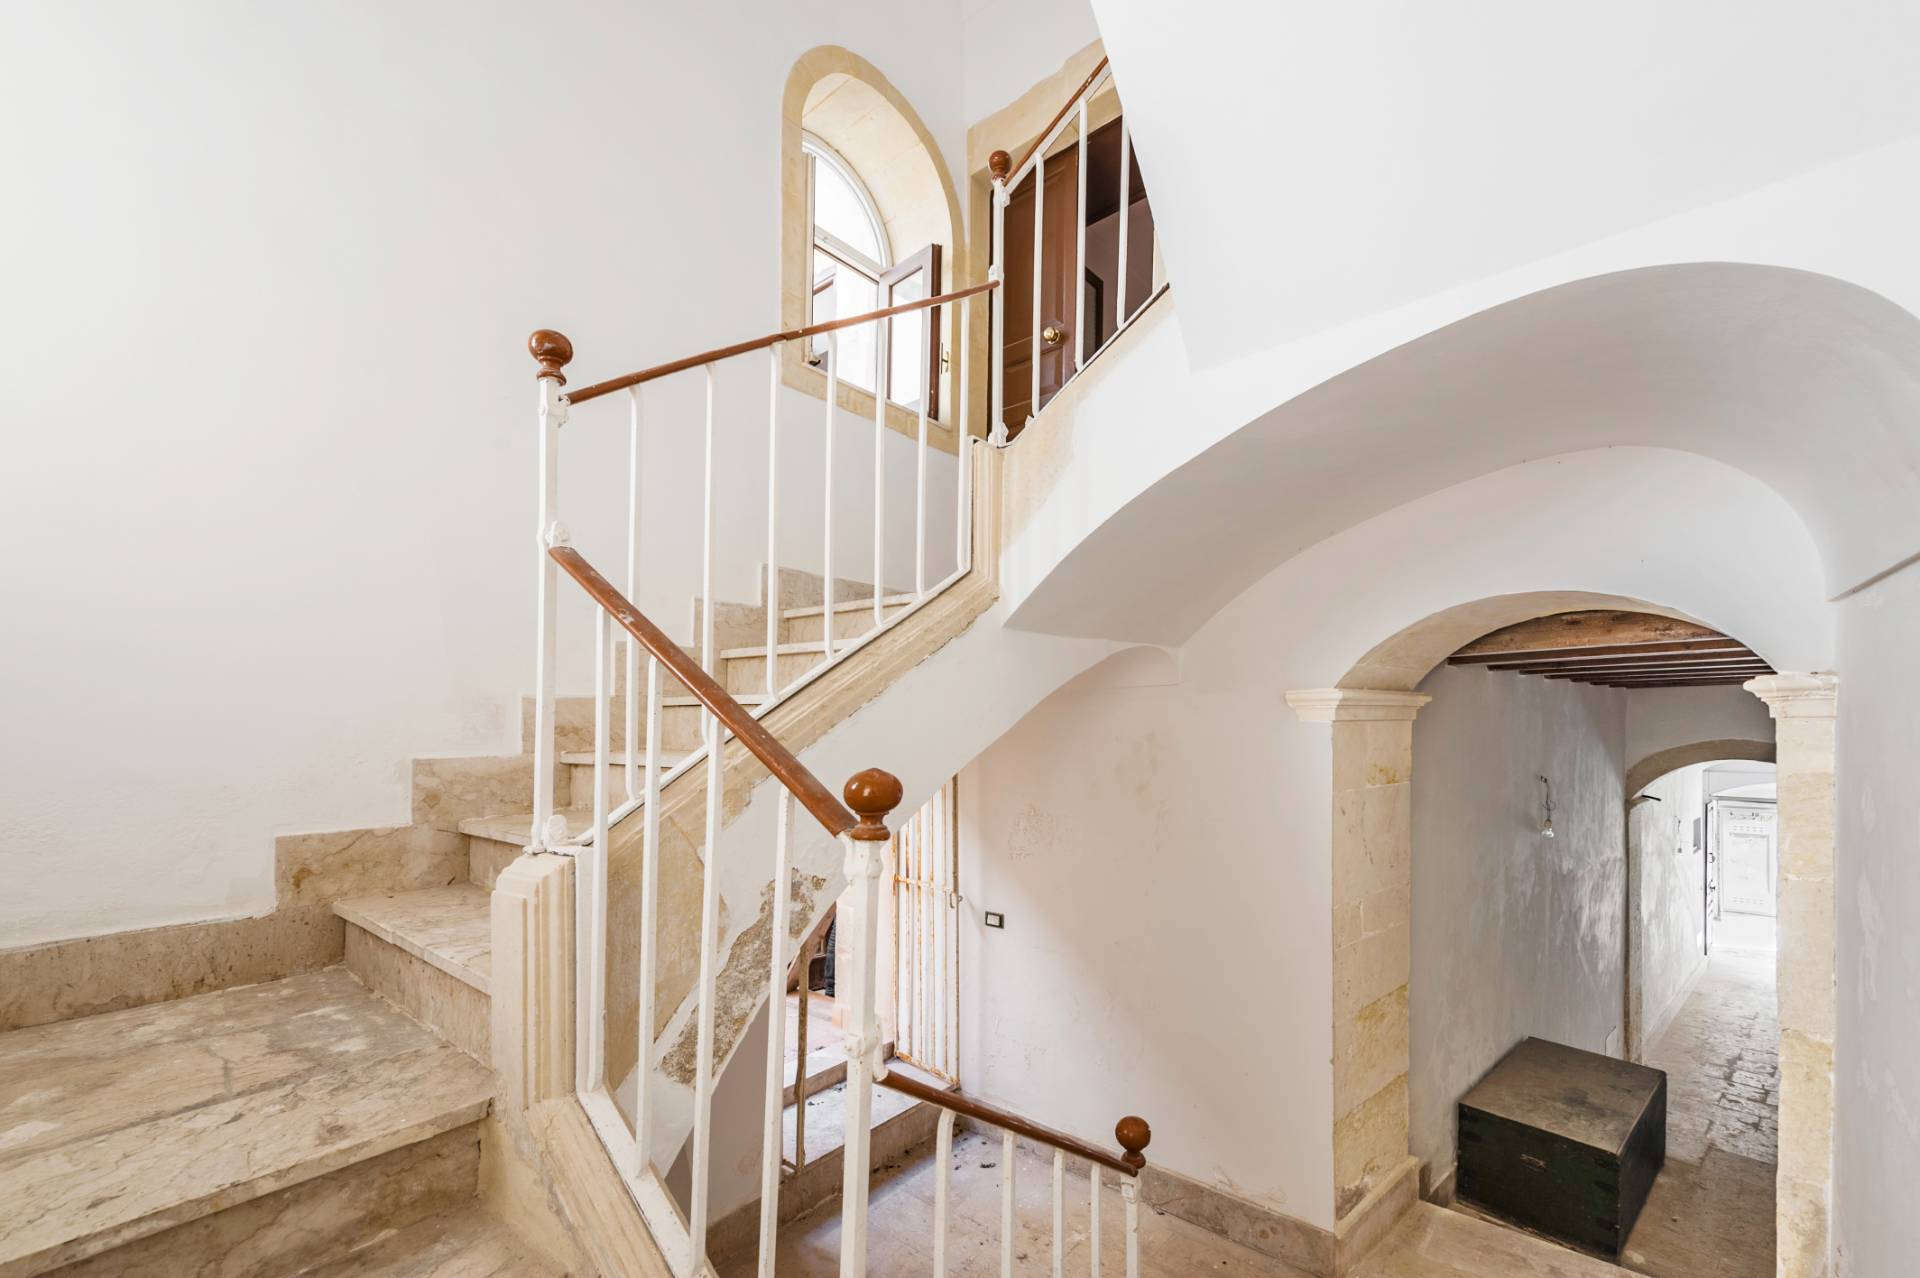 Palazzo in Vendita a Siracusa: 5 locali, 500 mq - Foto 3